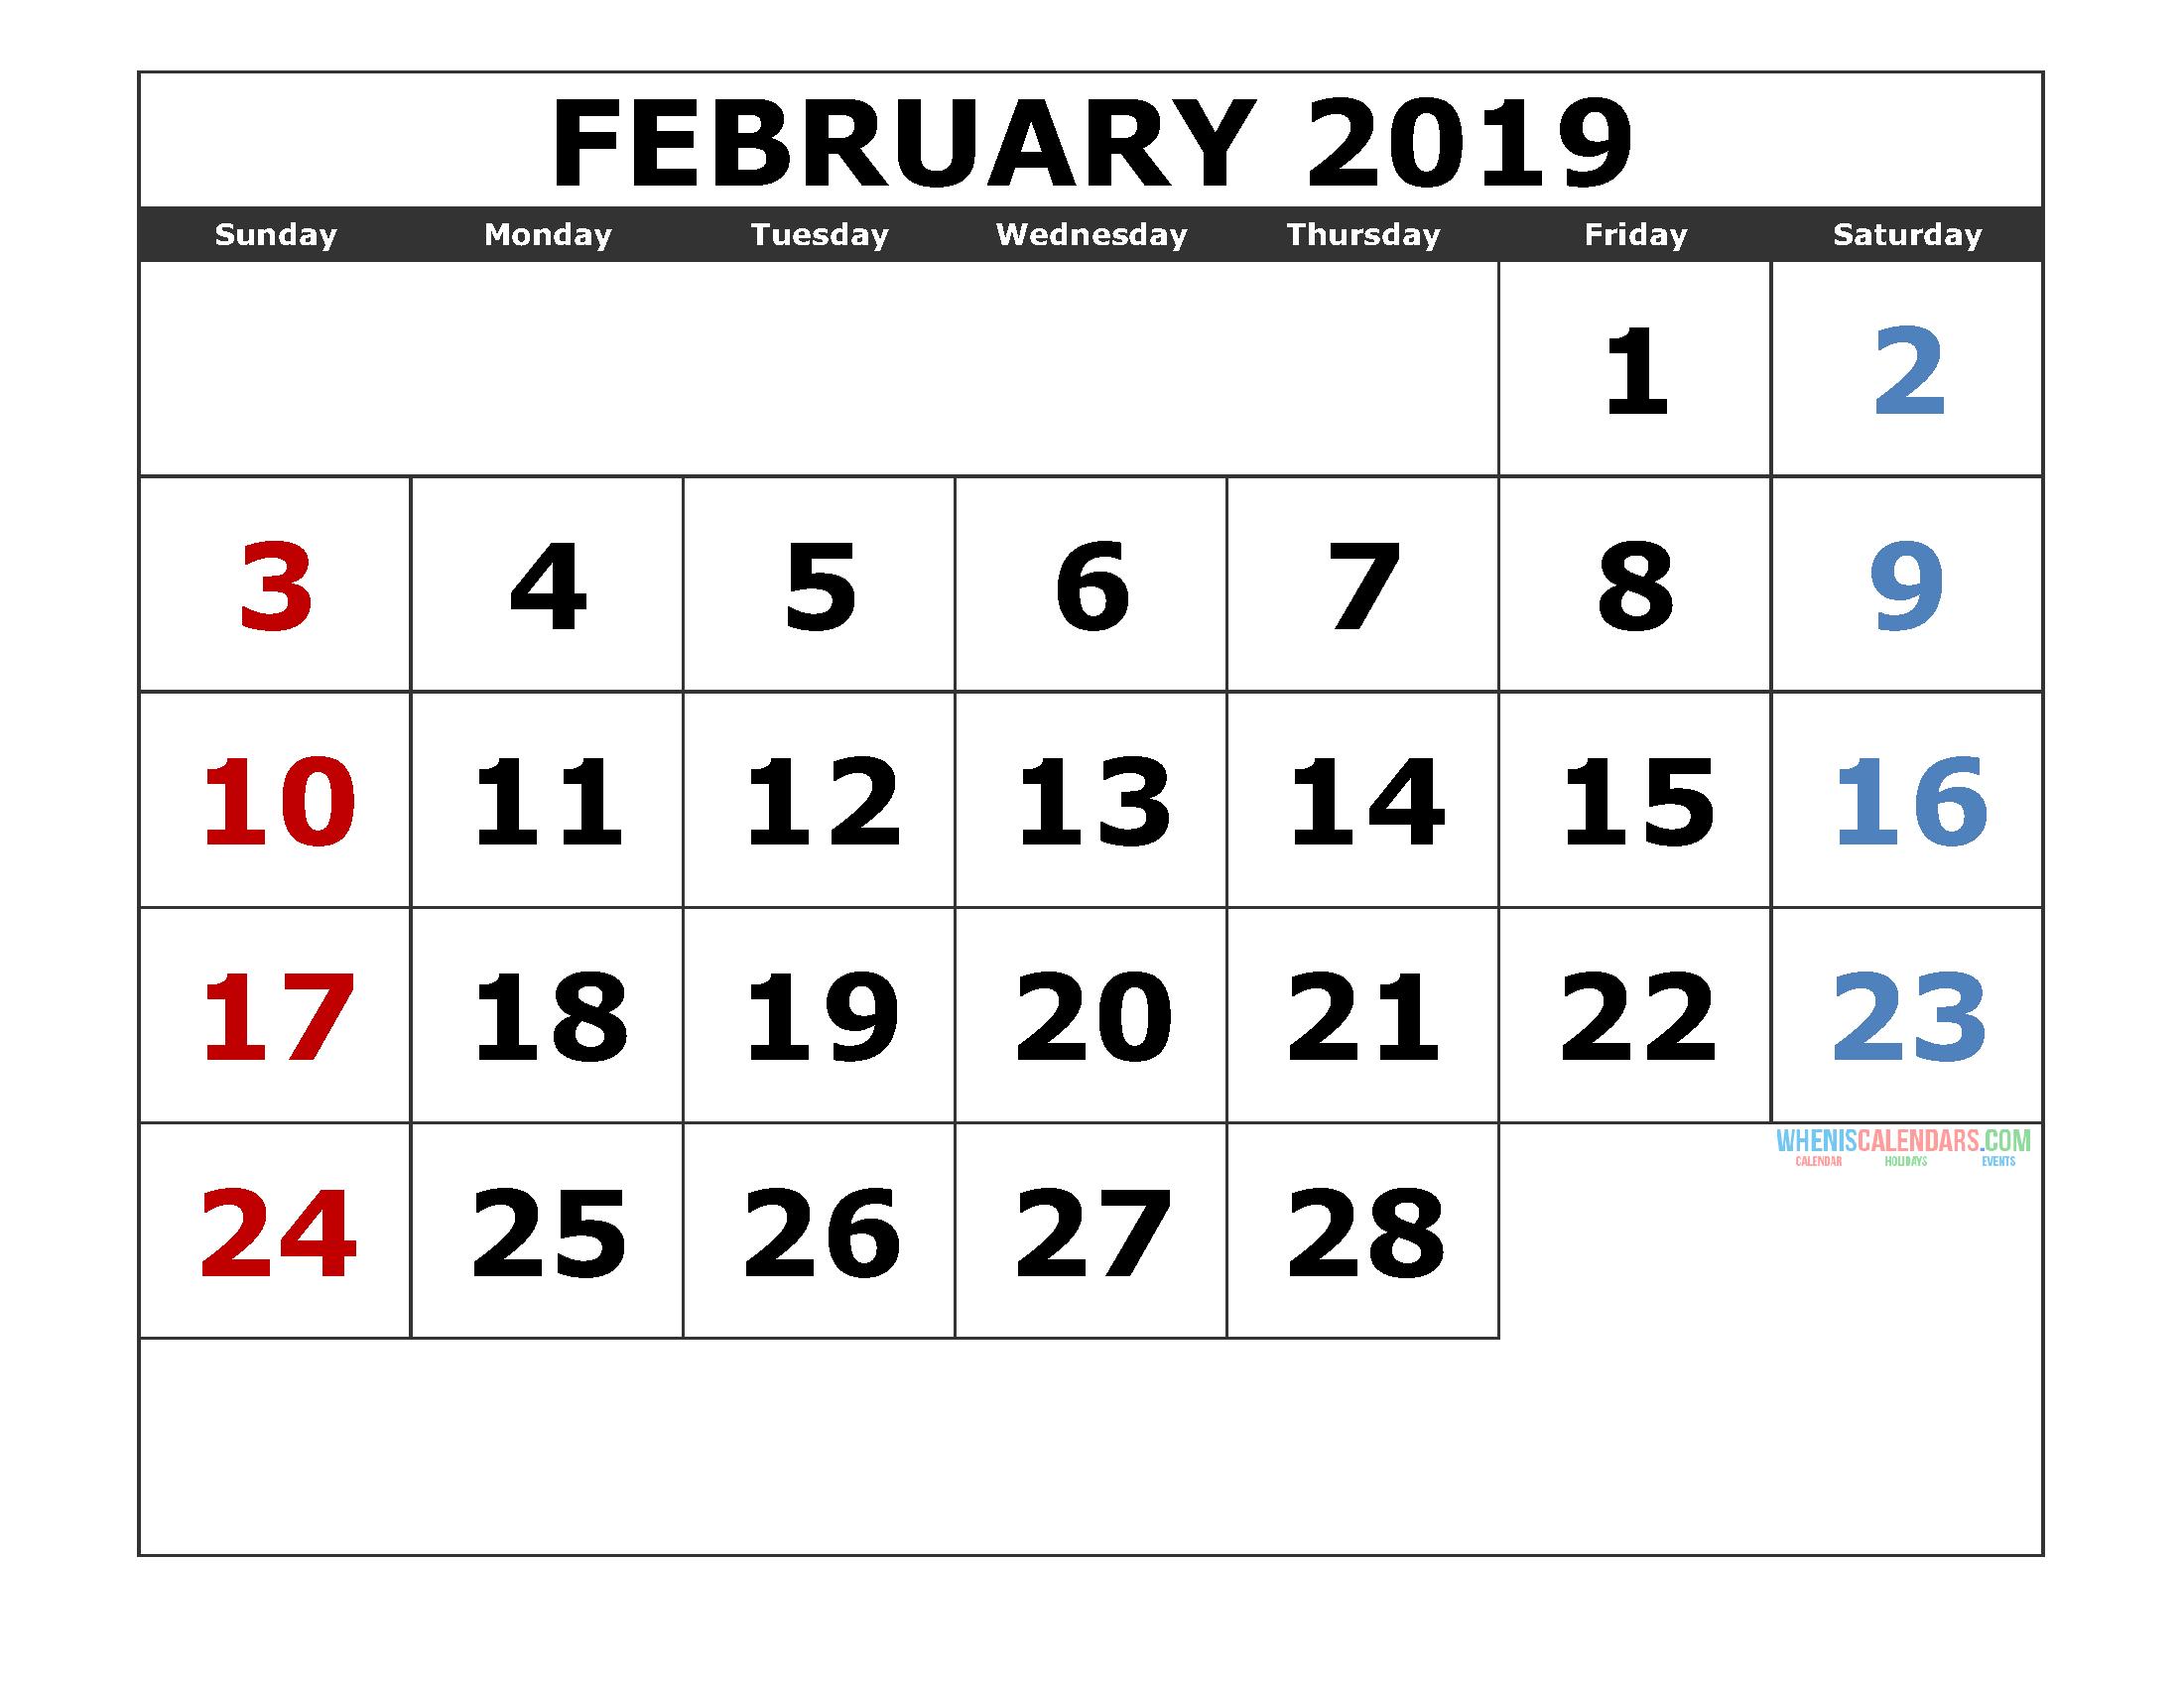 Wheniscalendars February 2019 February 2019 Printable Calendar Templates [ 2019 Monthly Calendar